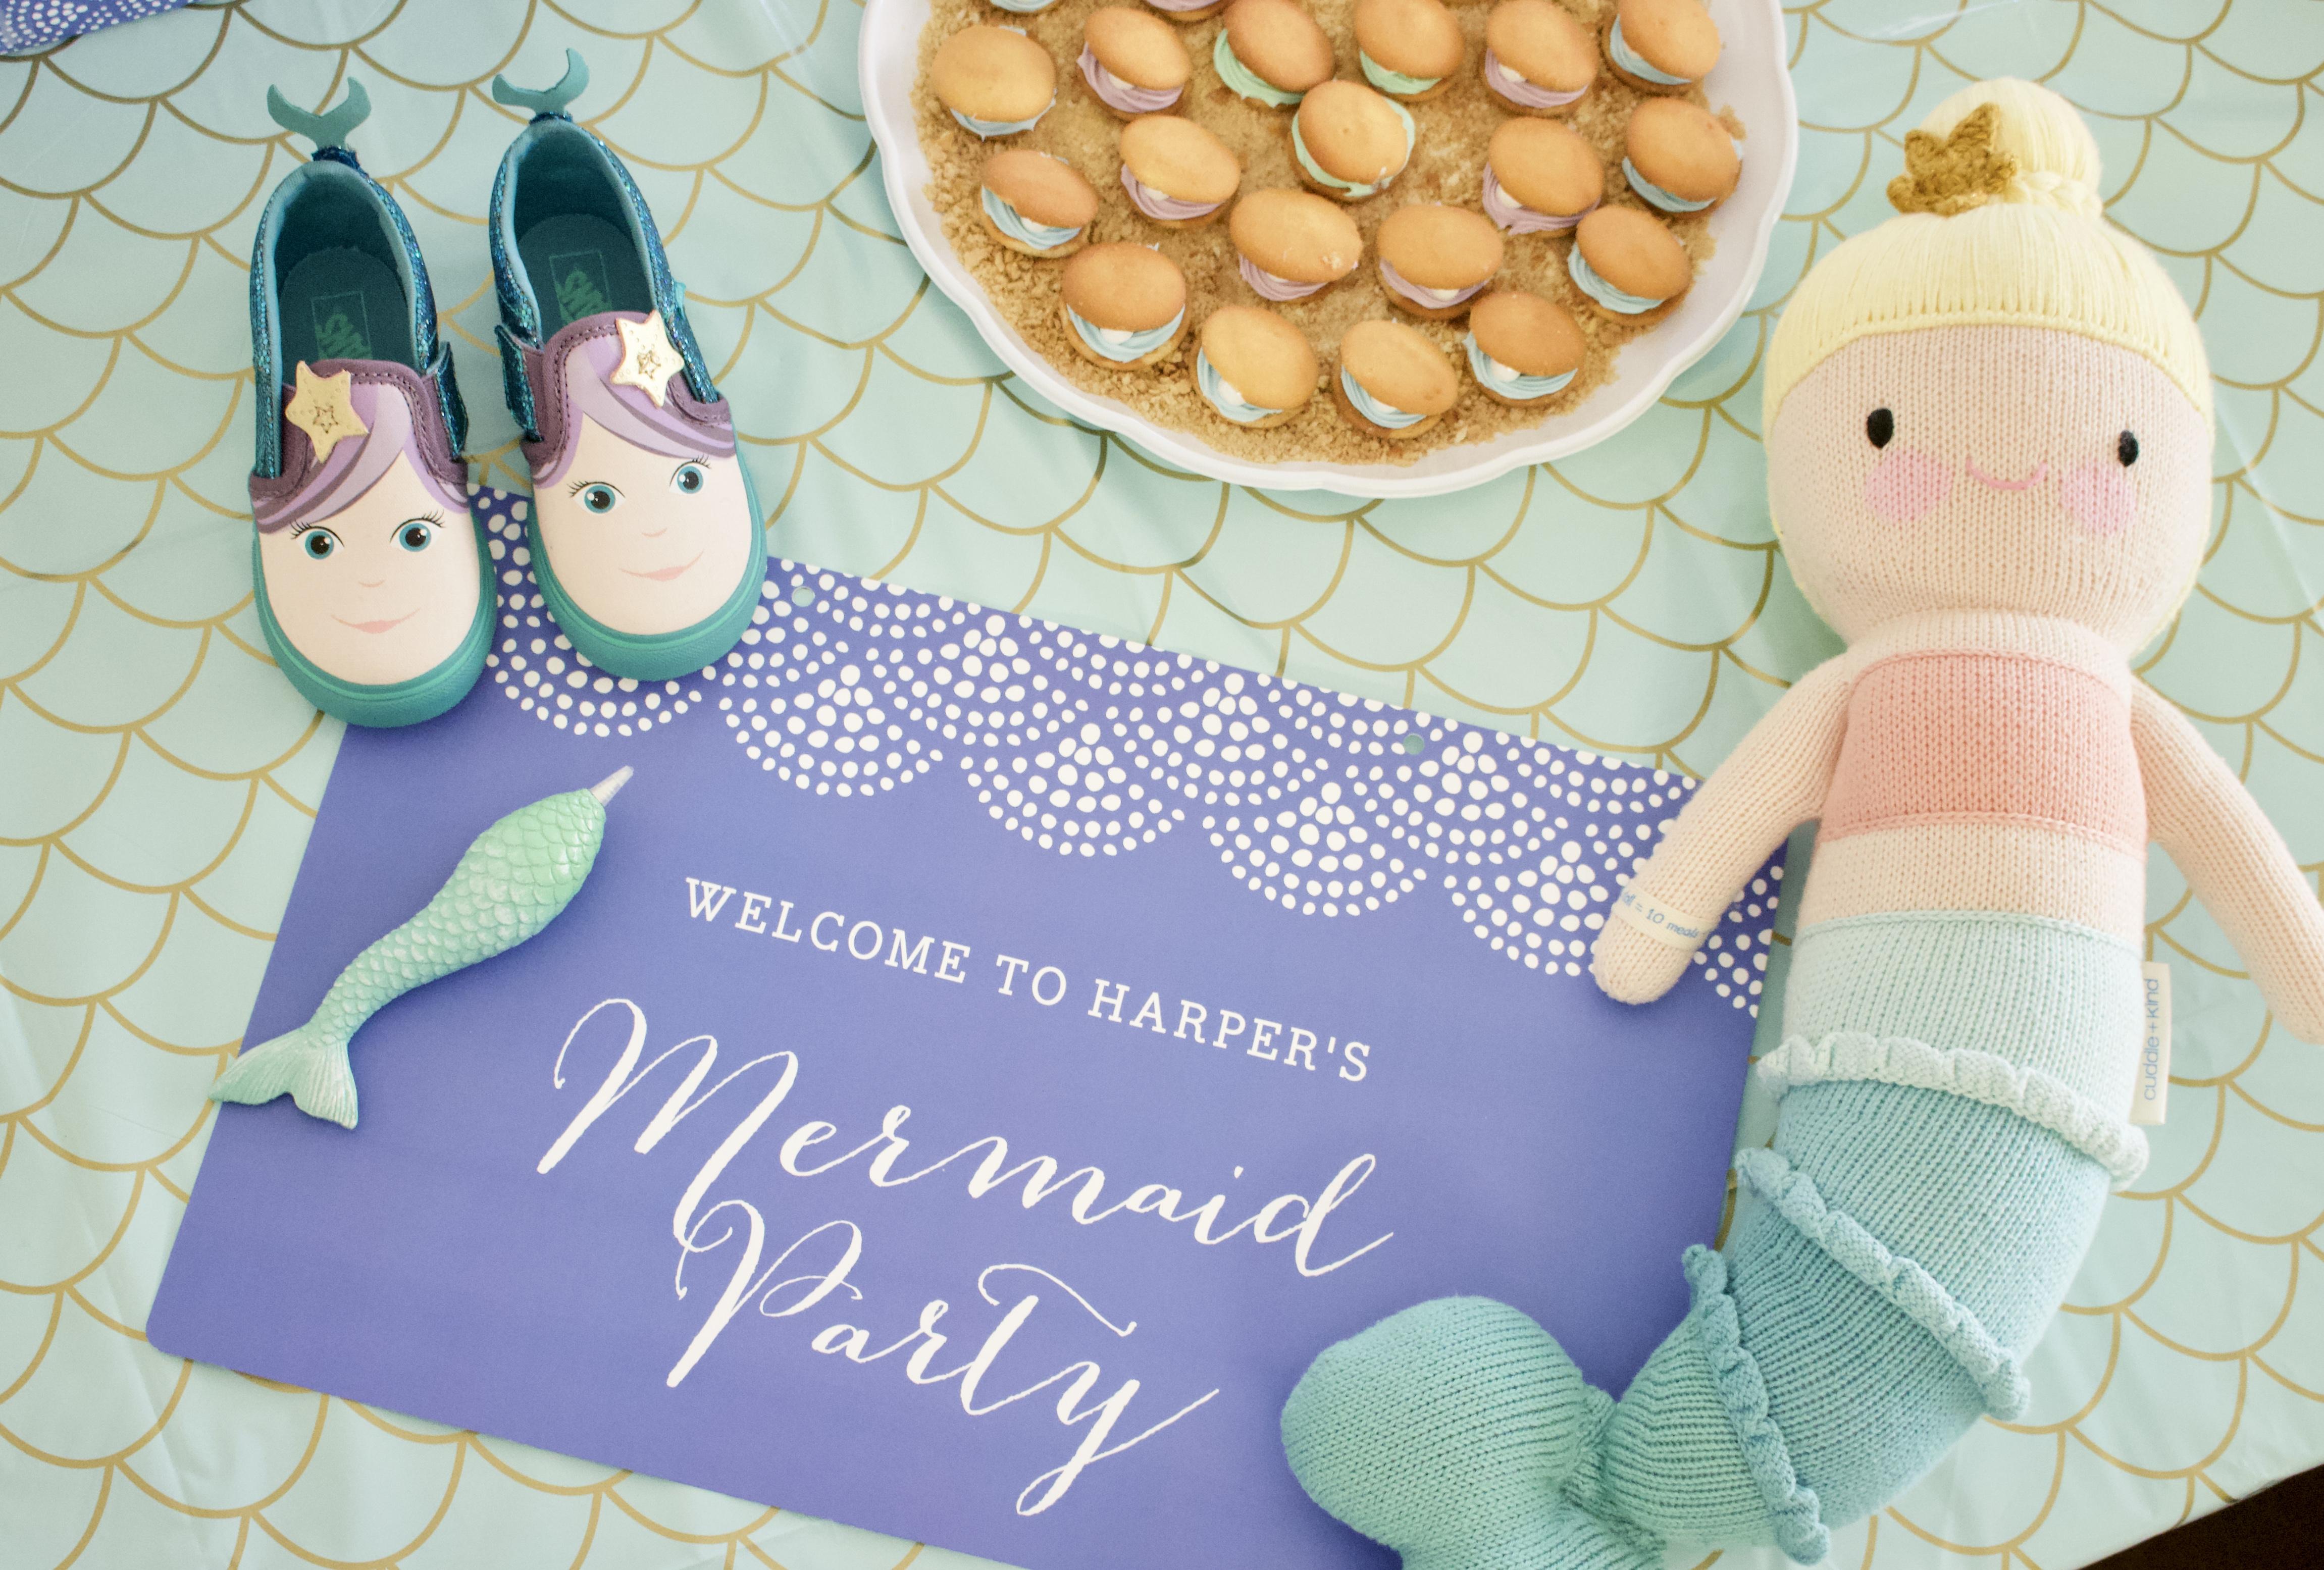 mermaid themed 3rd birthday party #mermaid #mermaidparty #birthdayparty #partydecor